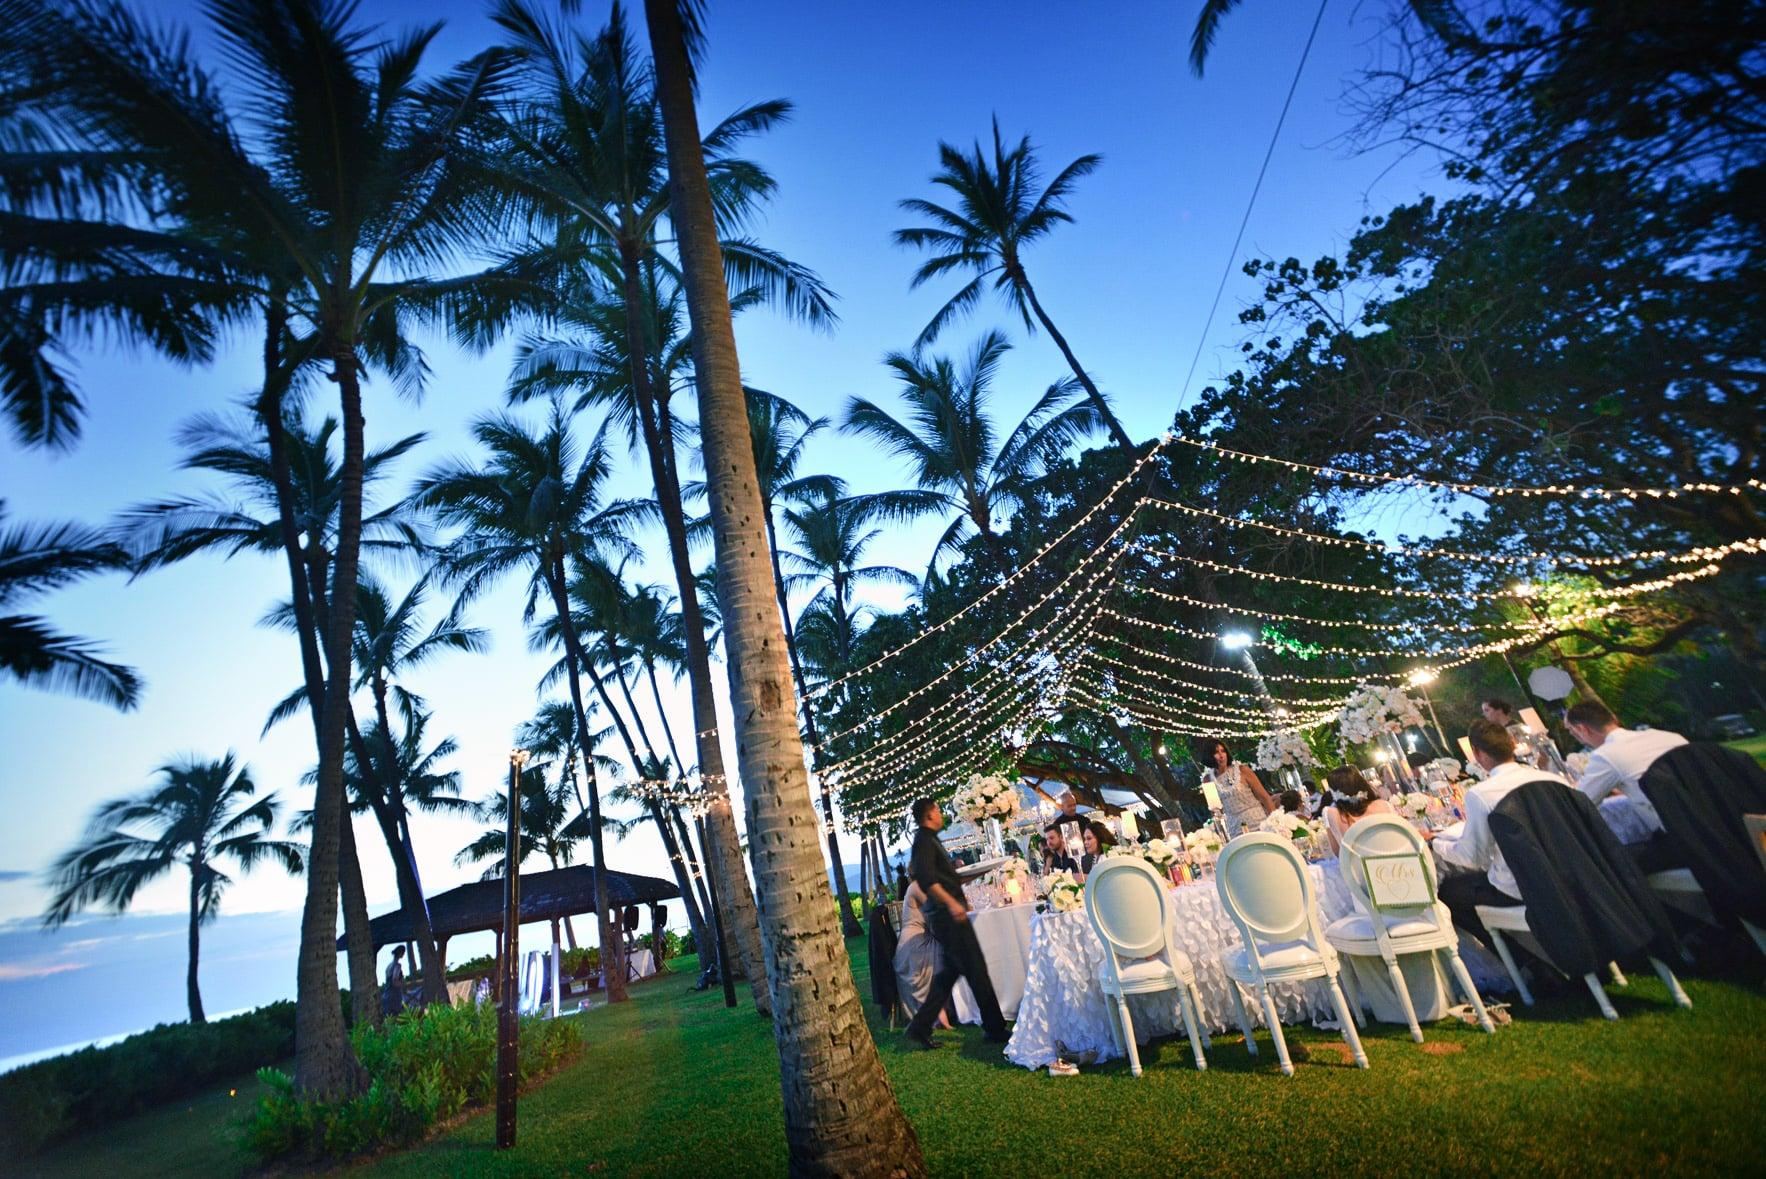 lanikuhonua beach wedding oahu hawaii stephen ludwig021.jpg